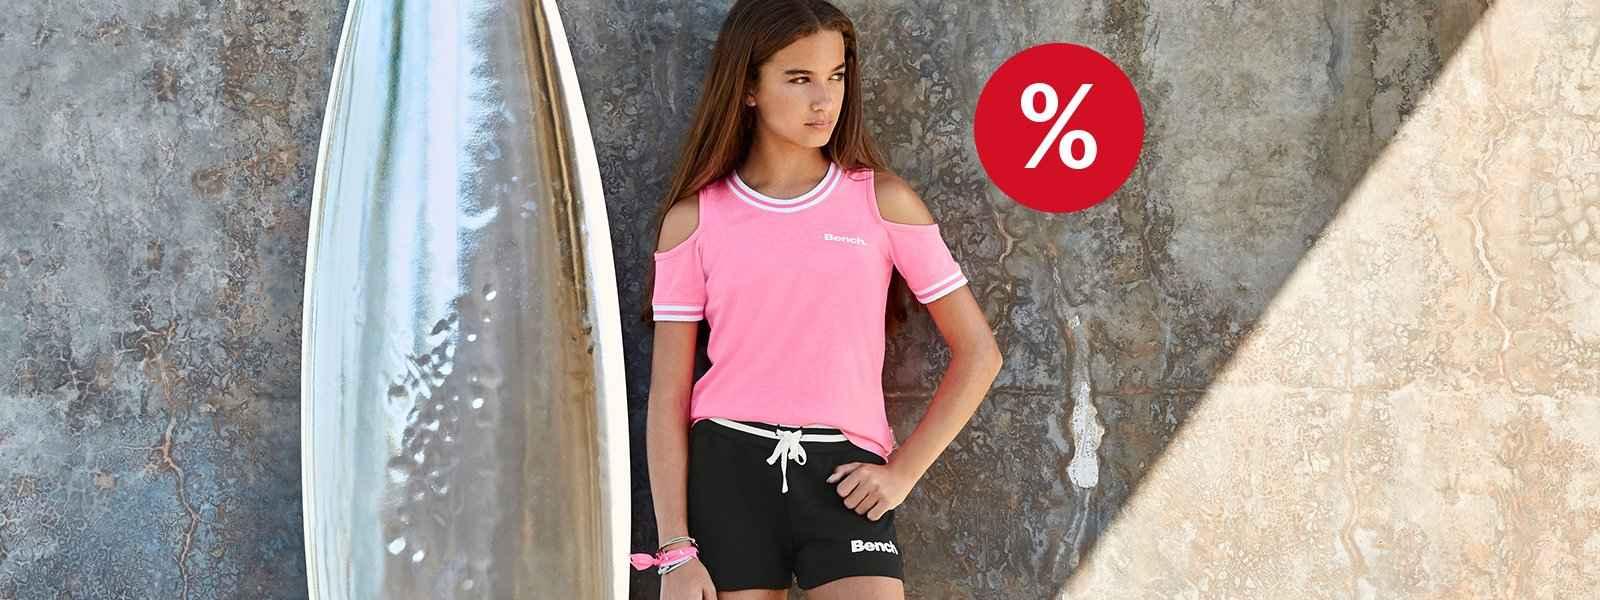 % Mädchen Shirts